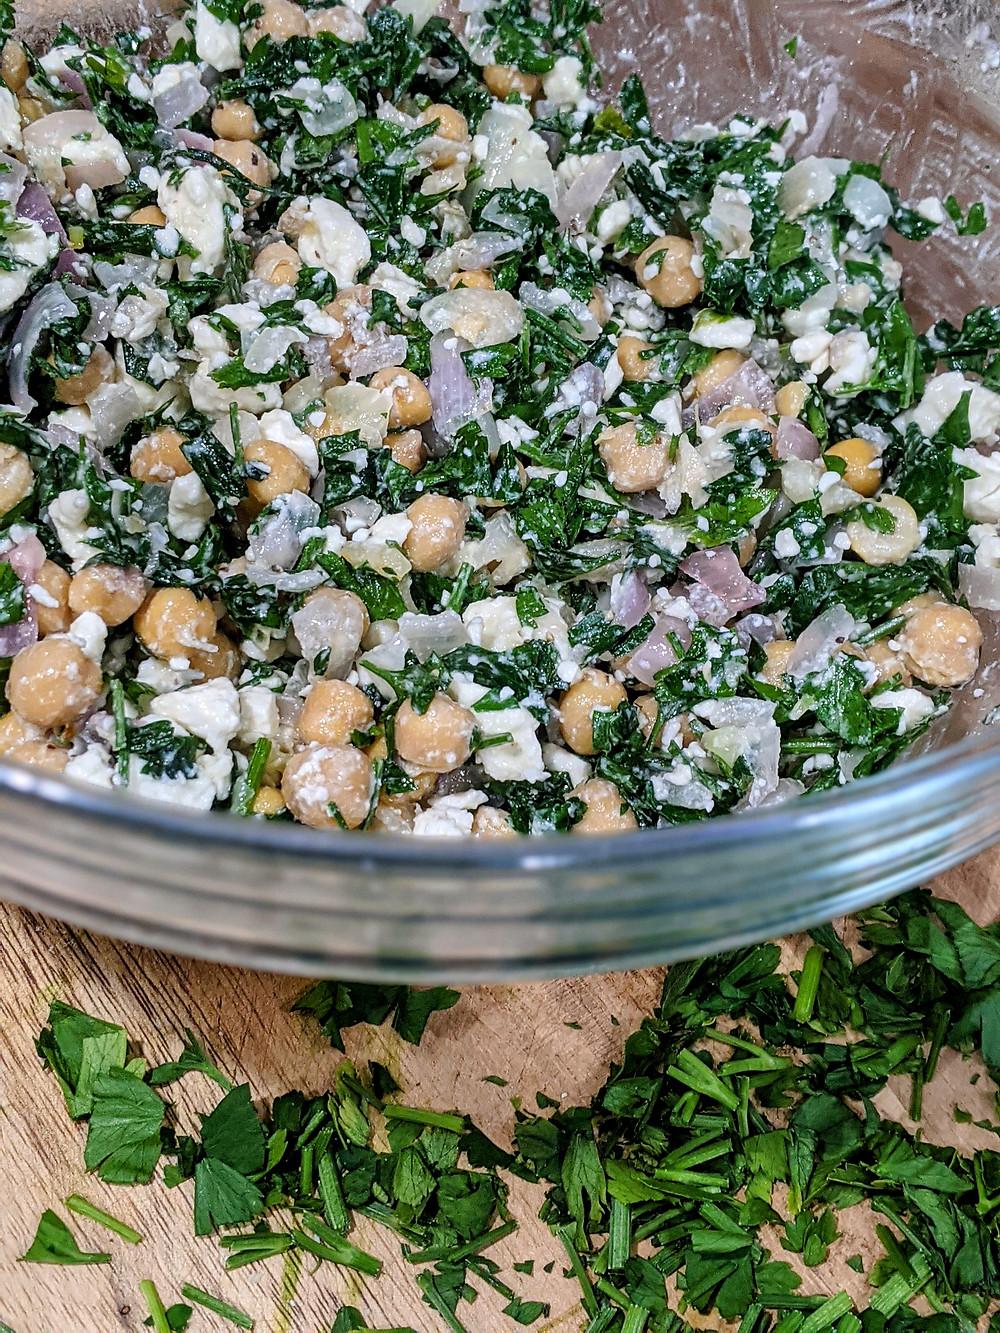 Our Mediterranean Parsley and Feta Chickpea Salad - amanda macgregor - joseph centineo - food allergy recipes